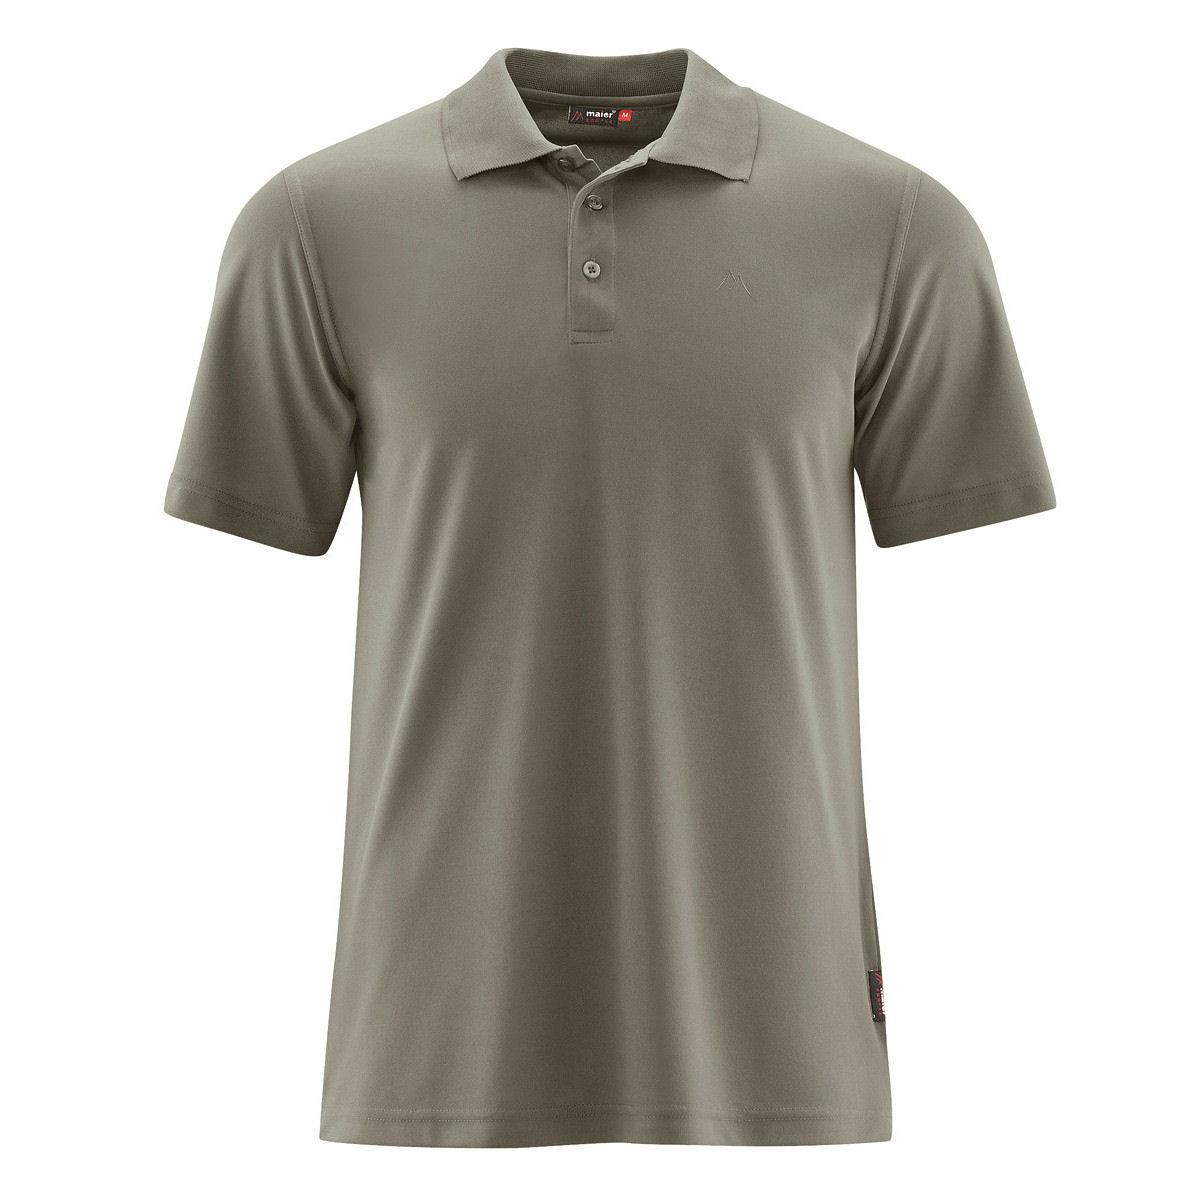 Löffler Poloshirt Merino Funktionsshirt grau